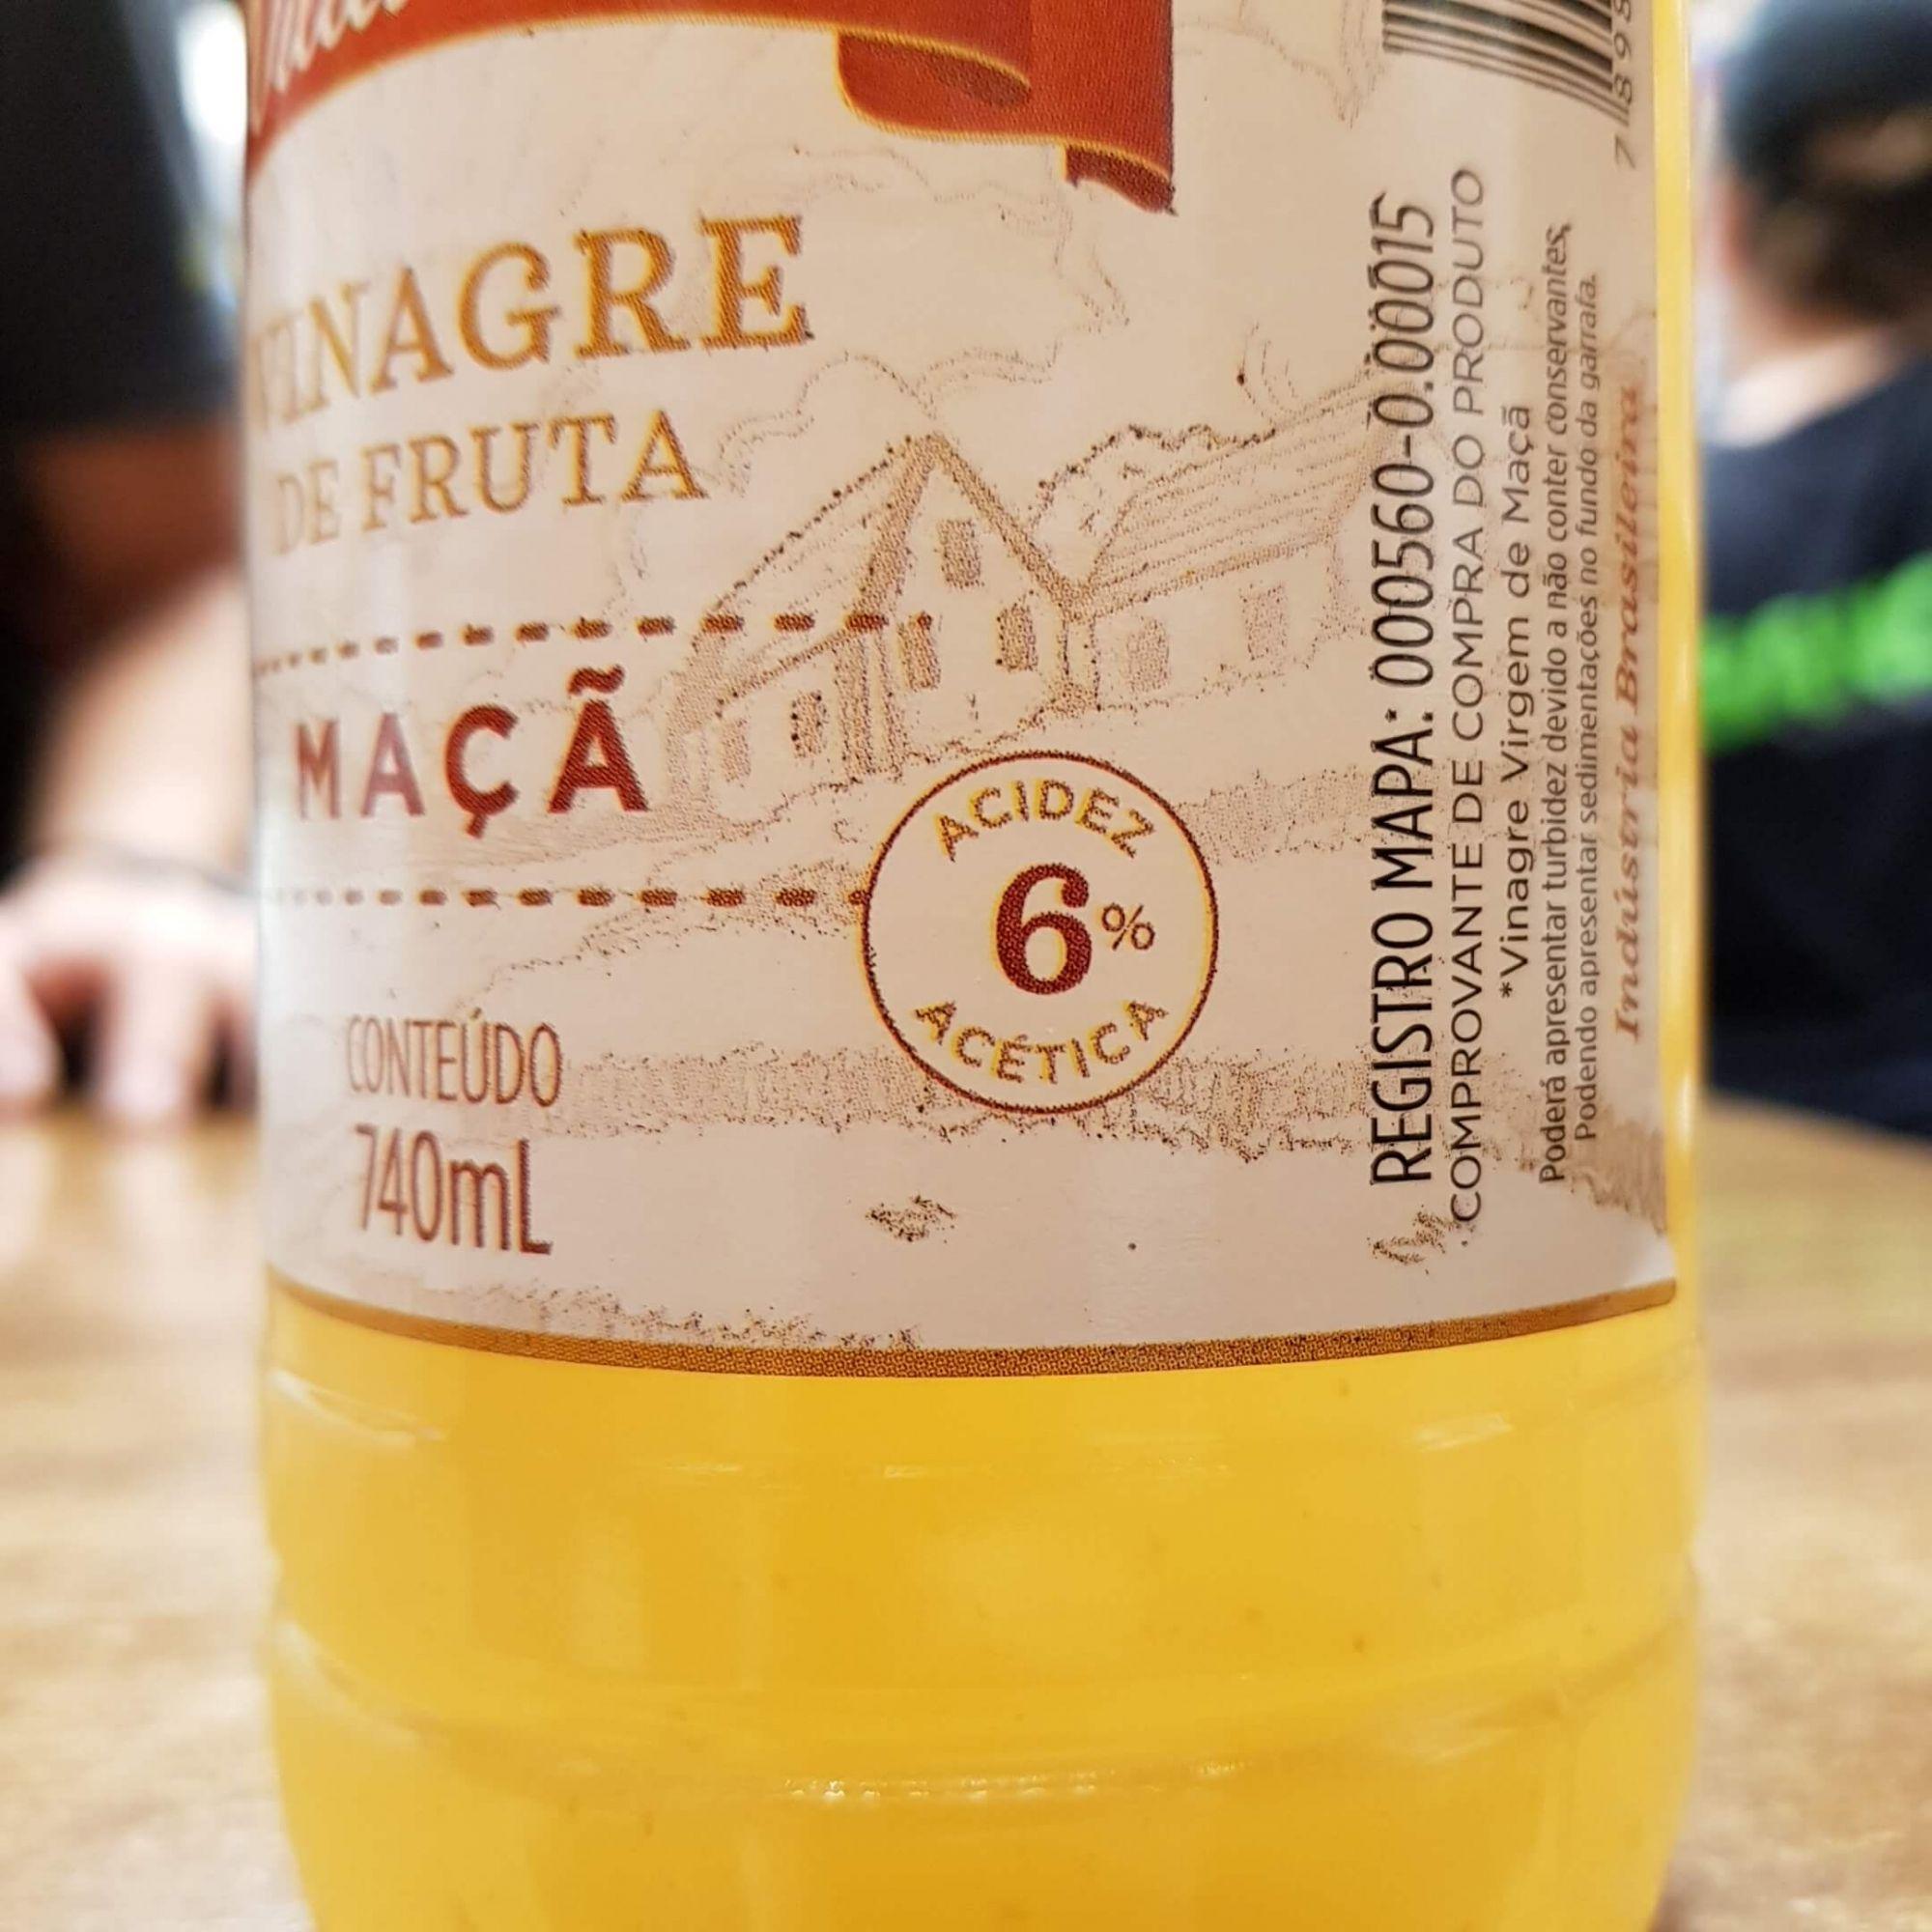 Vinagre de Maça 6% 740ml Villa Rica